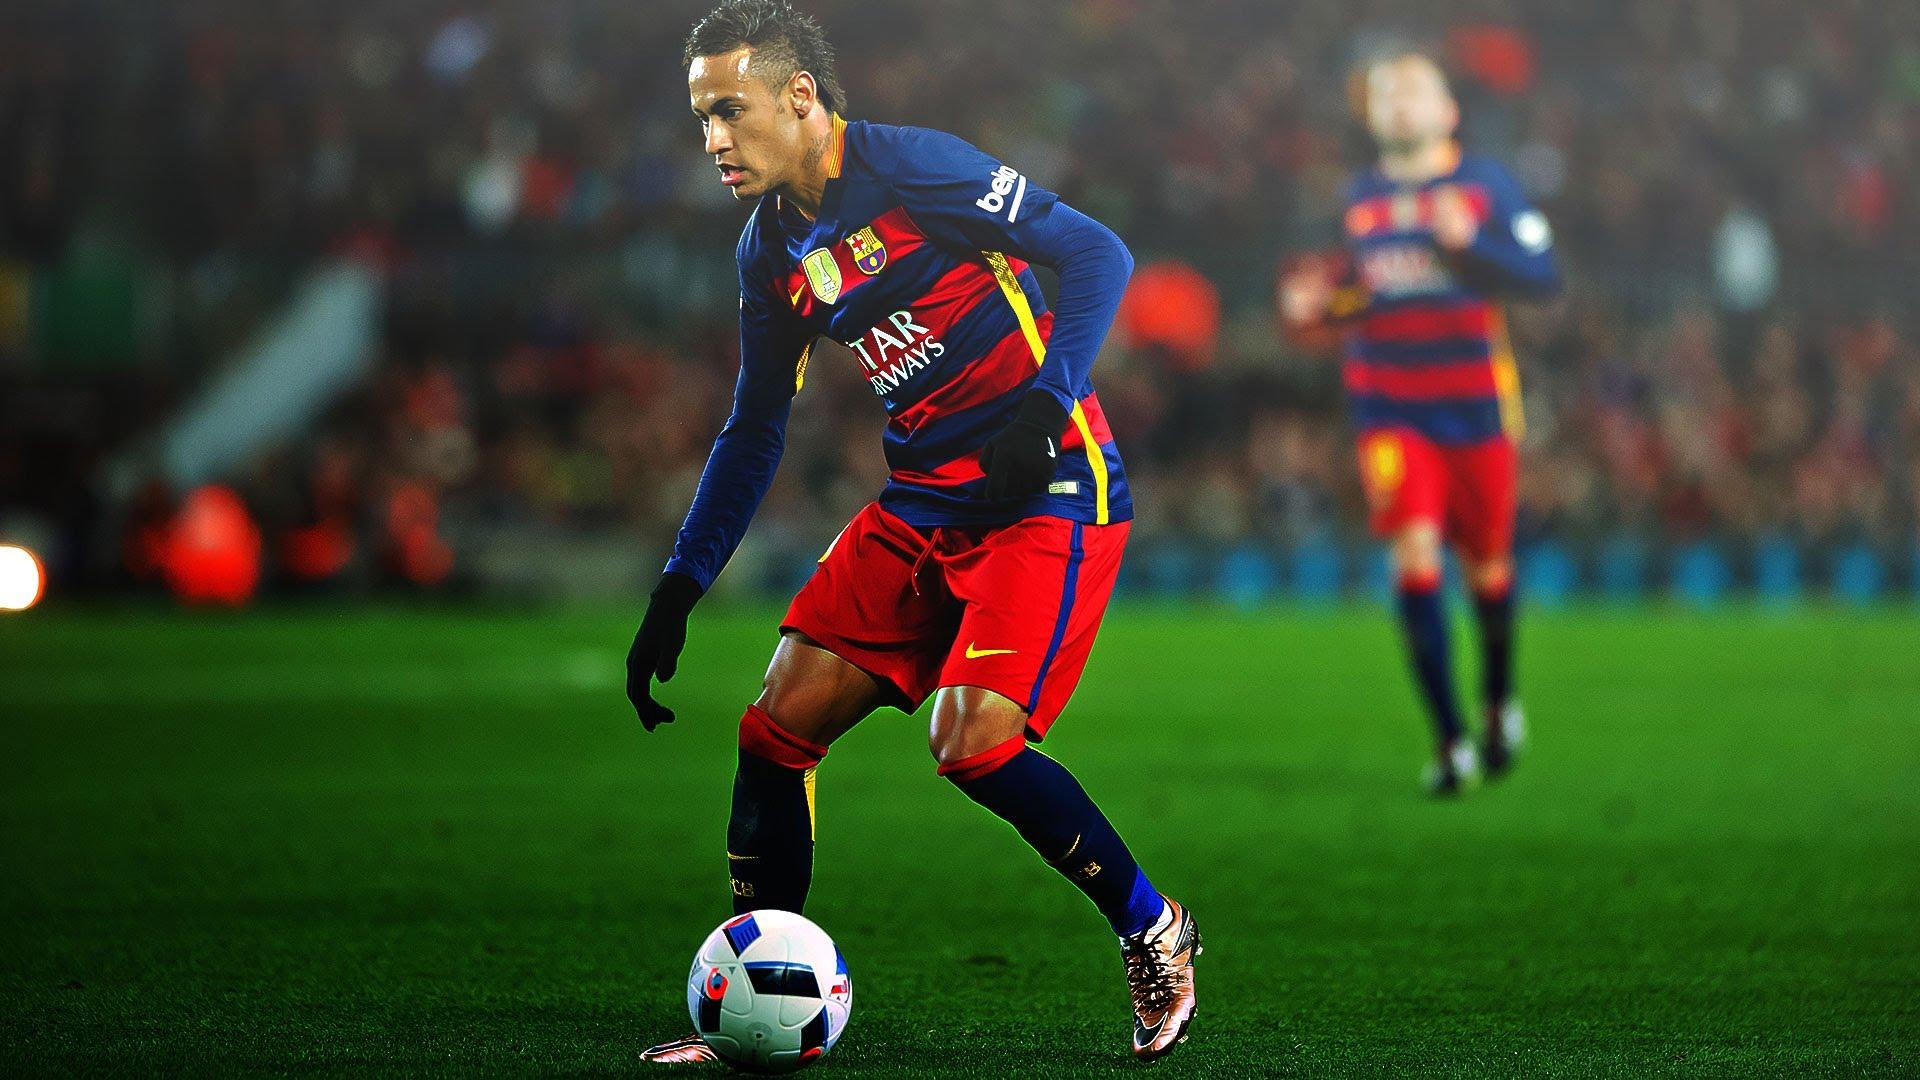 Fondo De Fútbol Hd: HD Football Kick Wallpapers